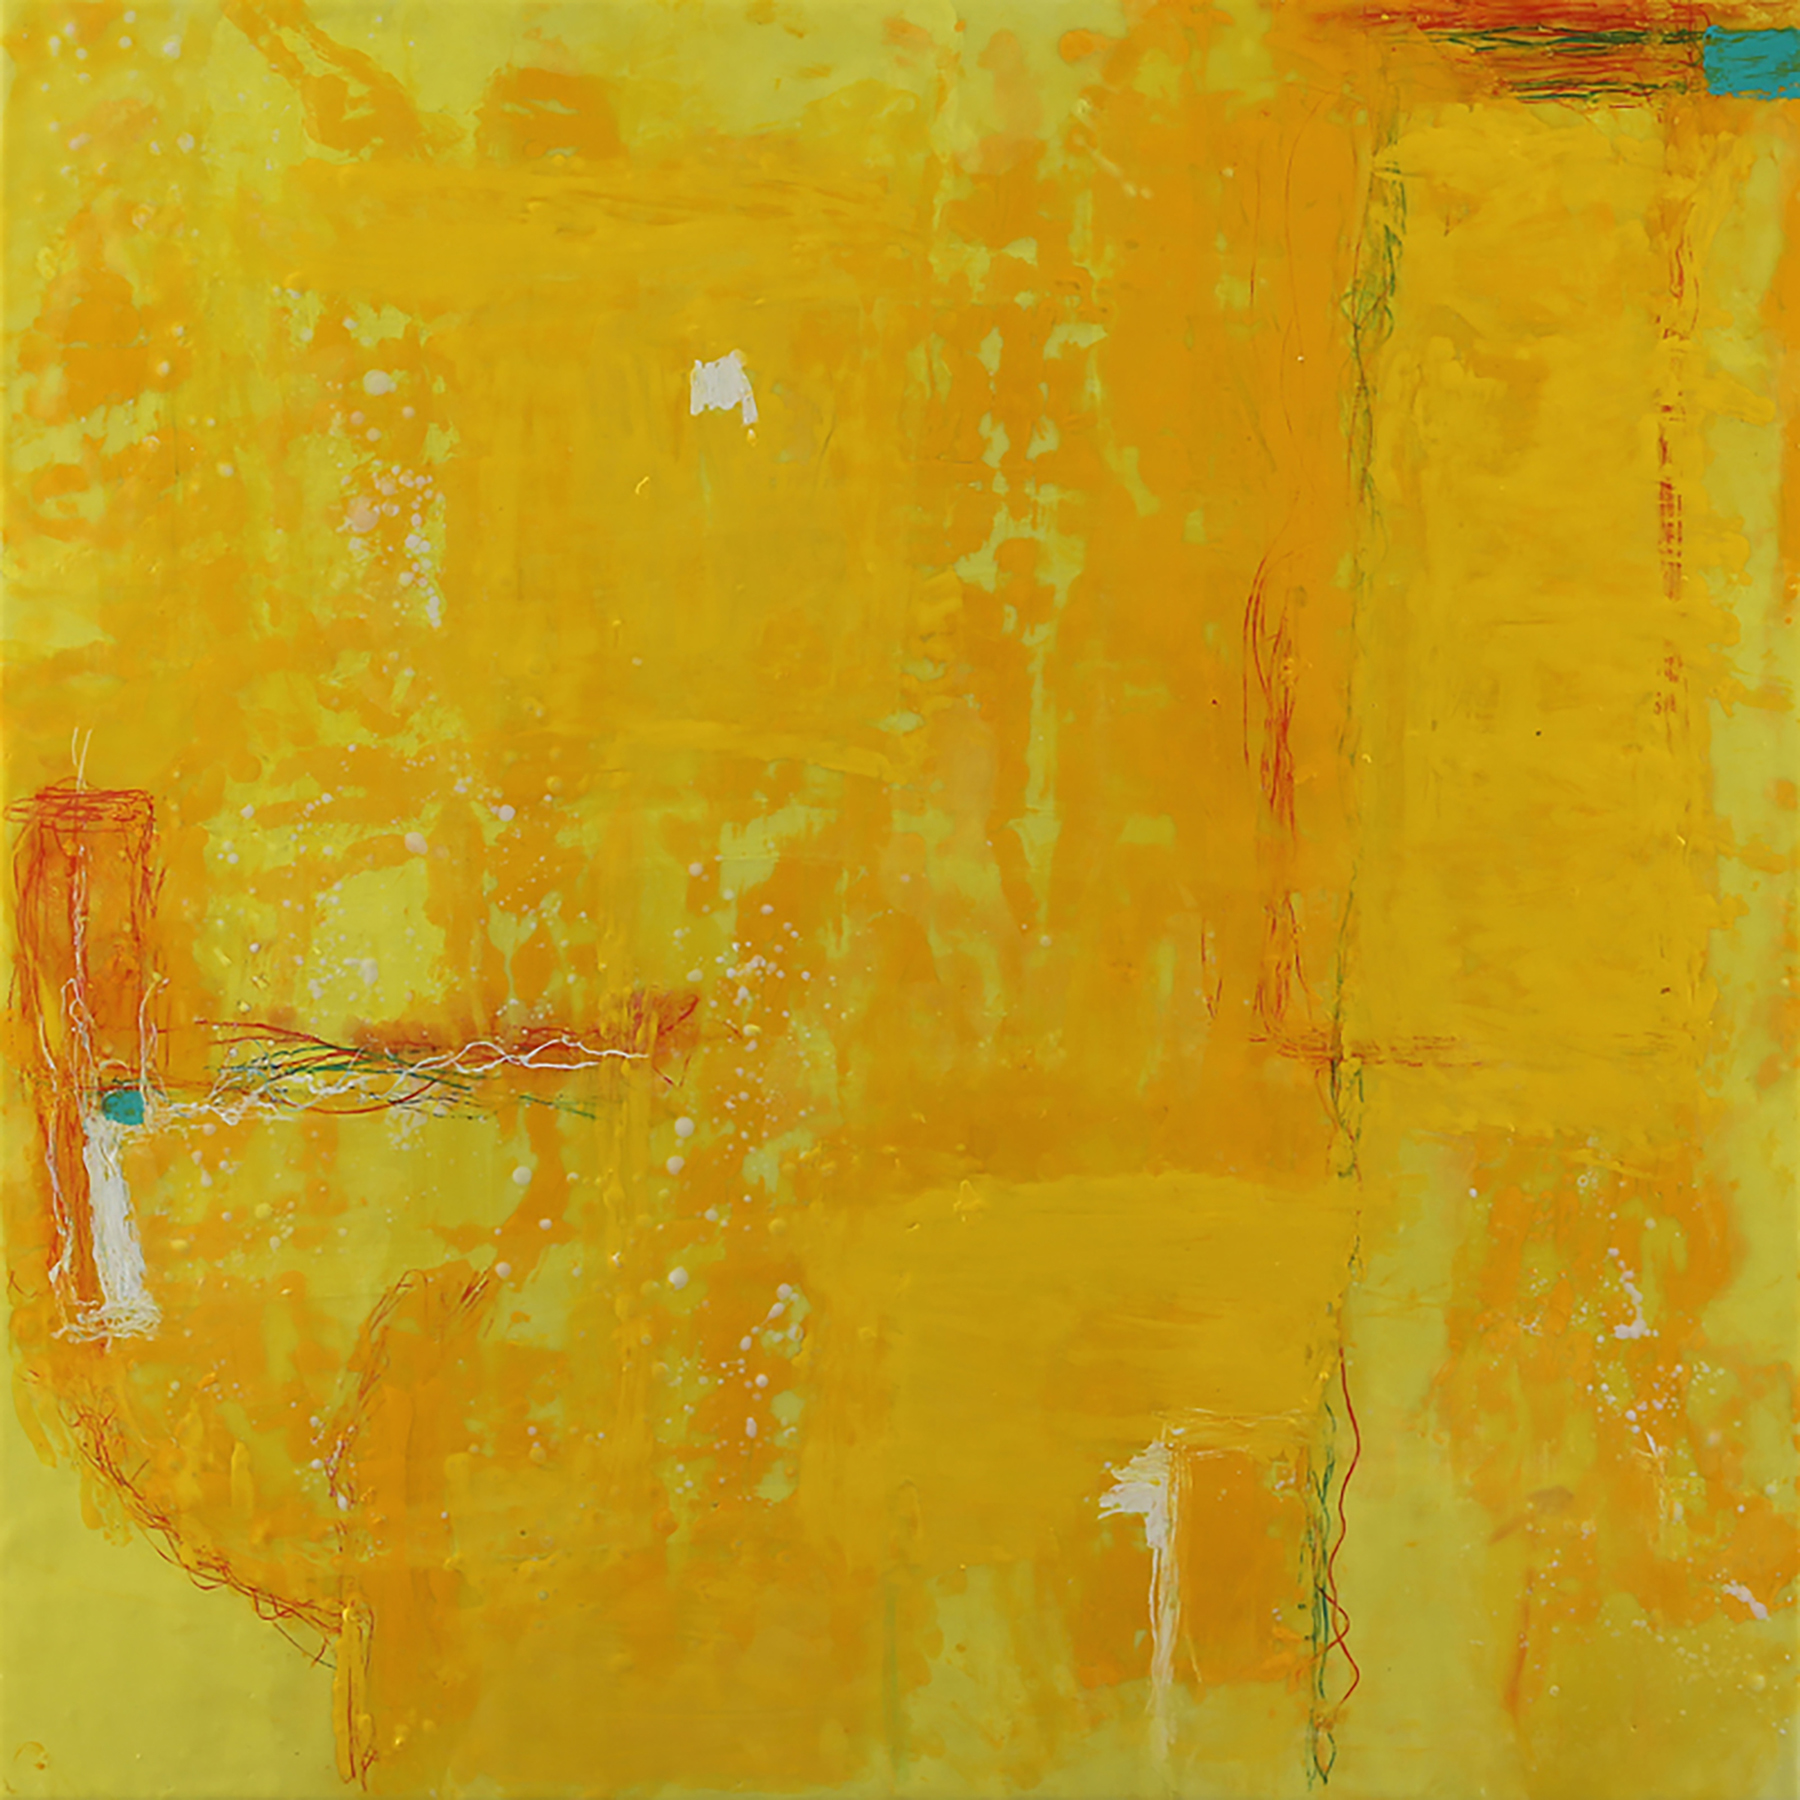 FrancescaSaveri-_Hello Sunshine_-36_x36_-encaustic-2015-$3000.jpg